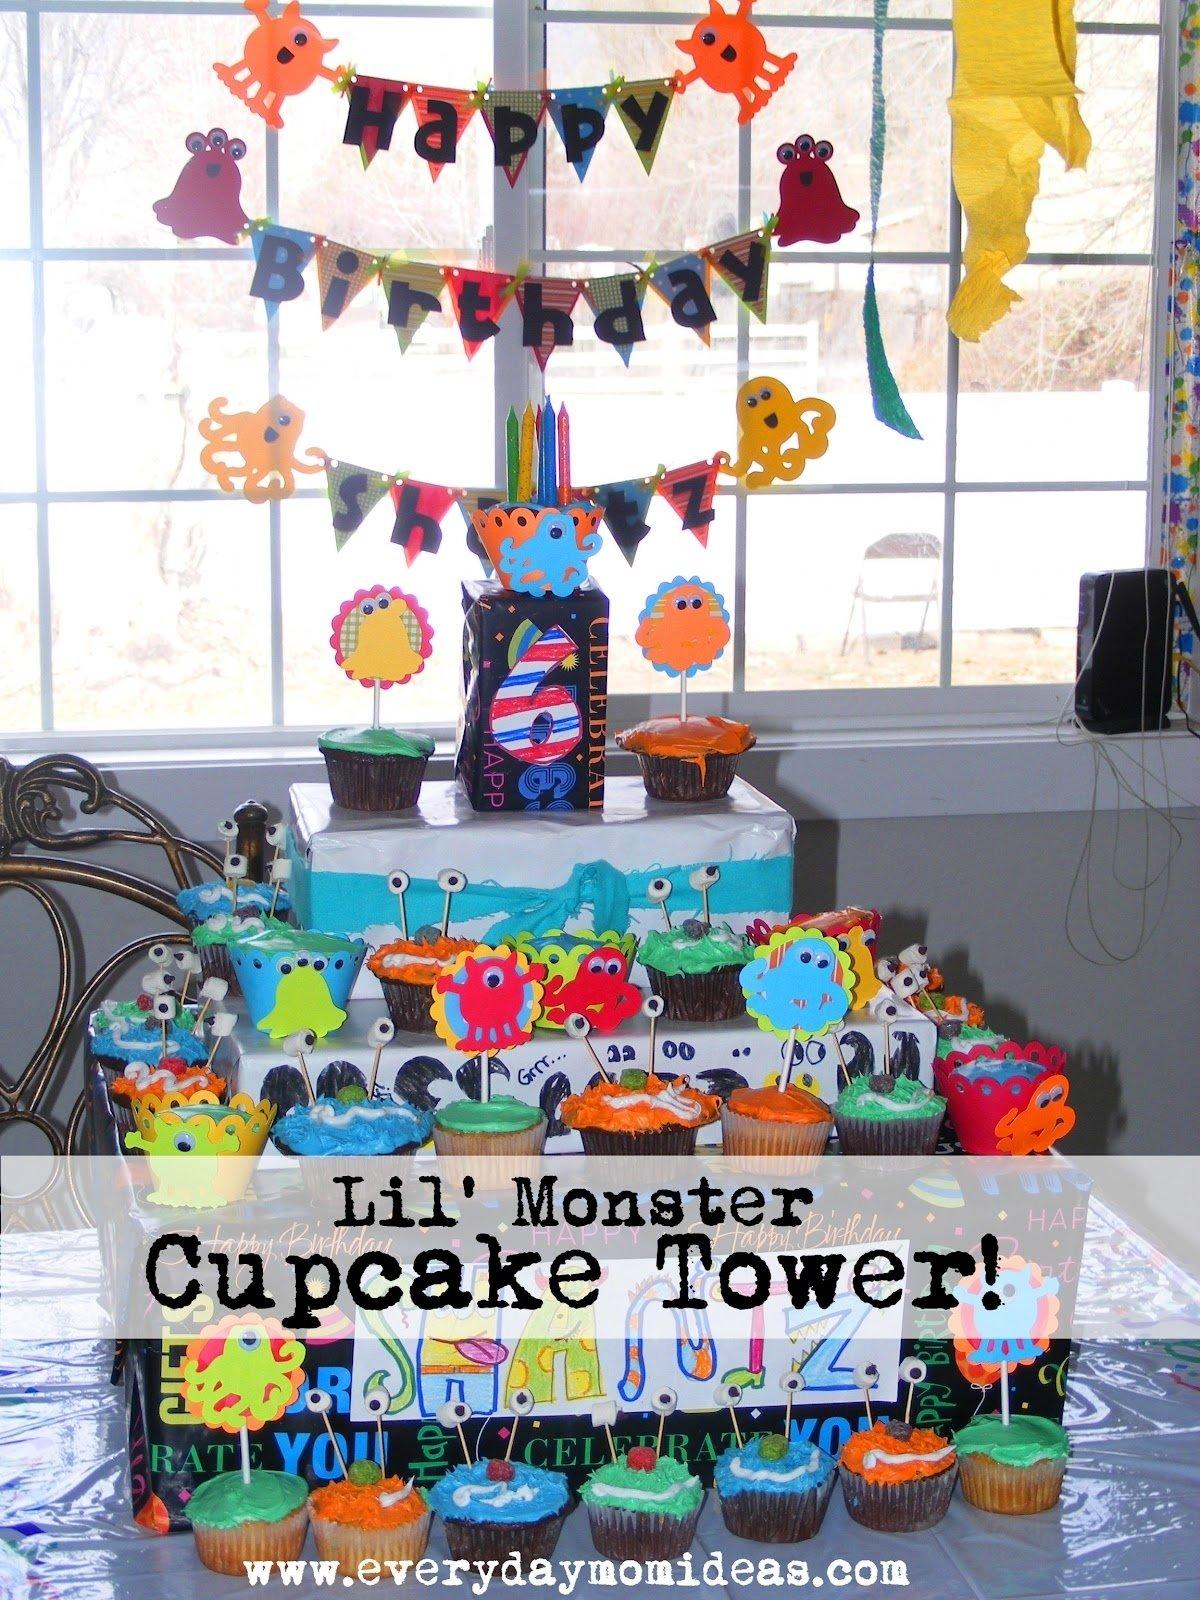 little monster bash -birthday party ideas - everyday mom ideas